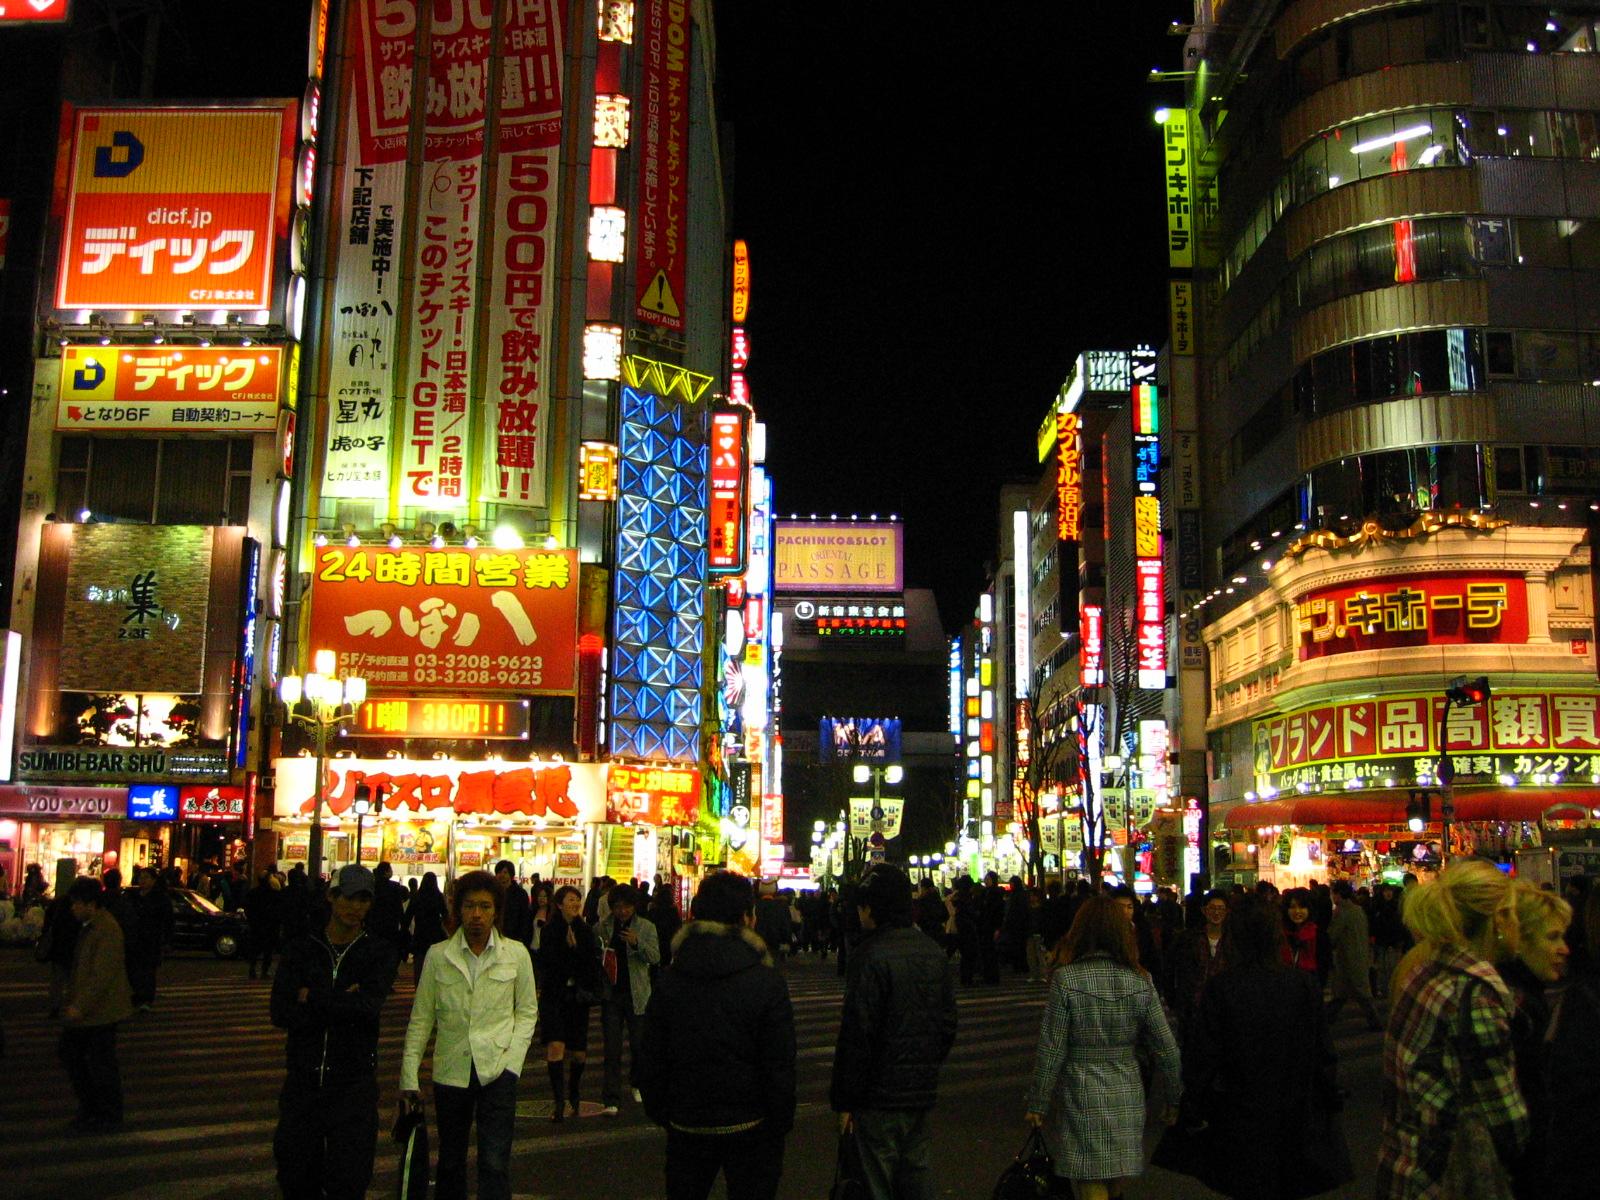 8589130586018 tokyo at night wallpaper hdjpg 1600x1200